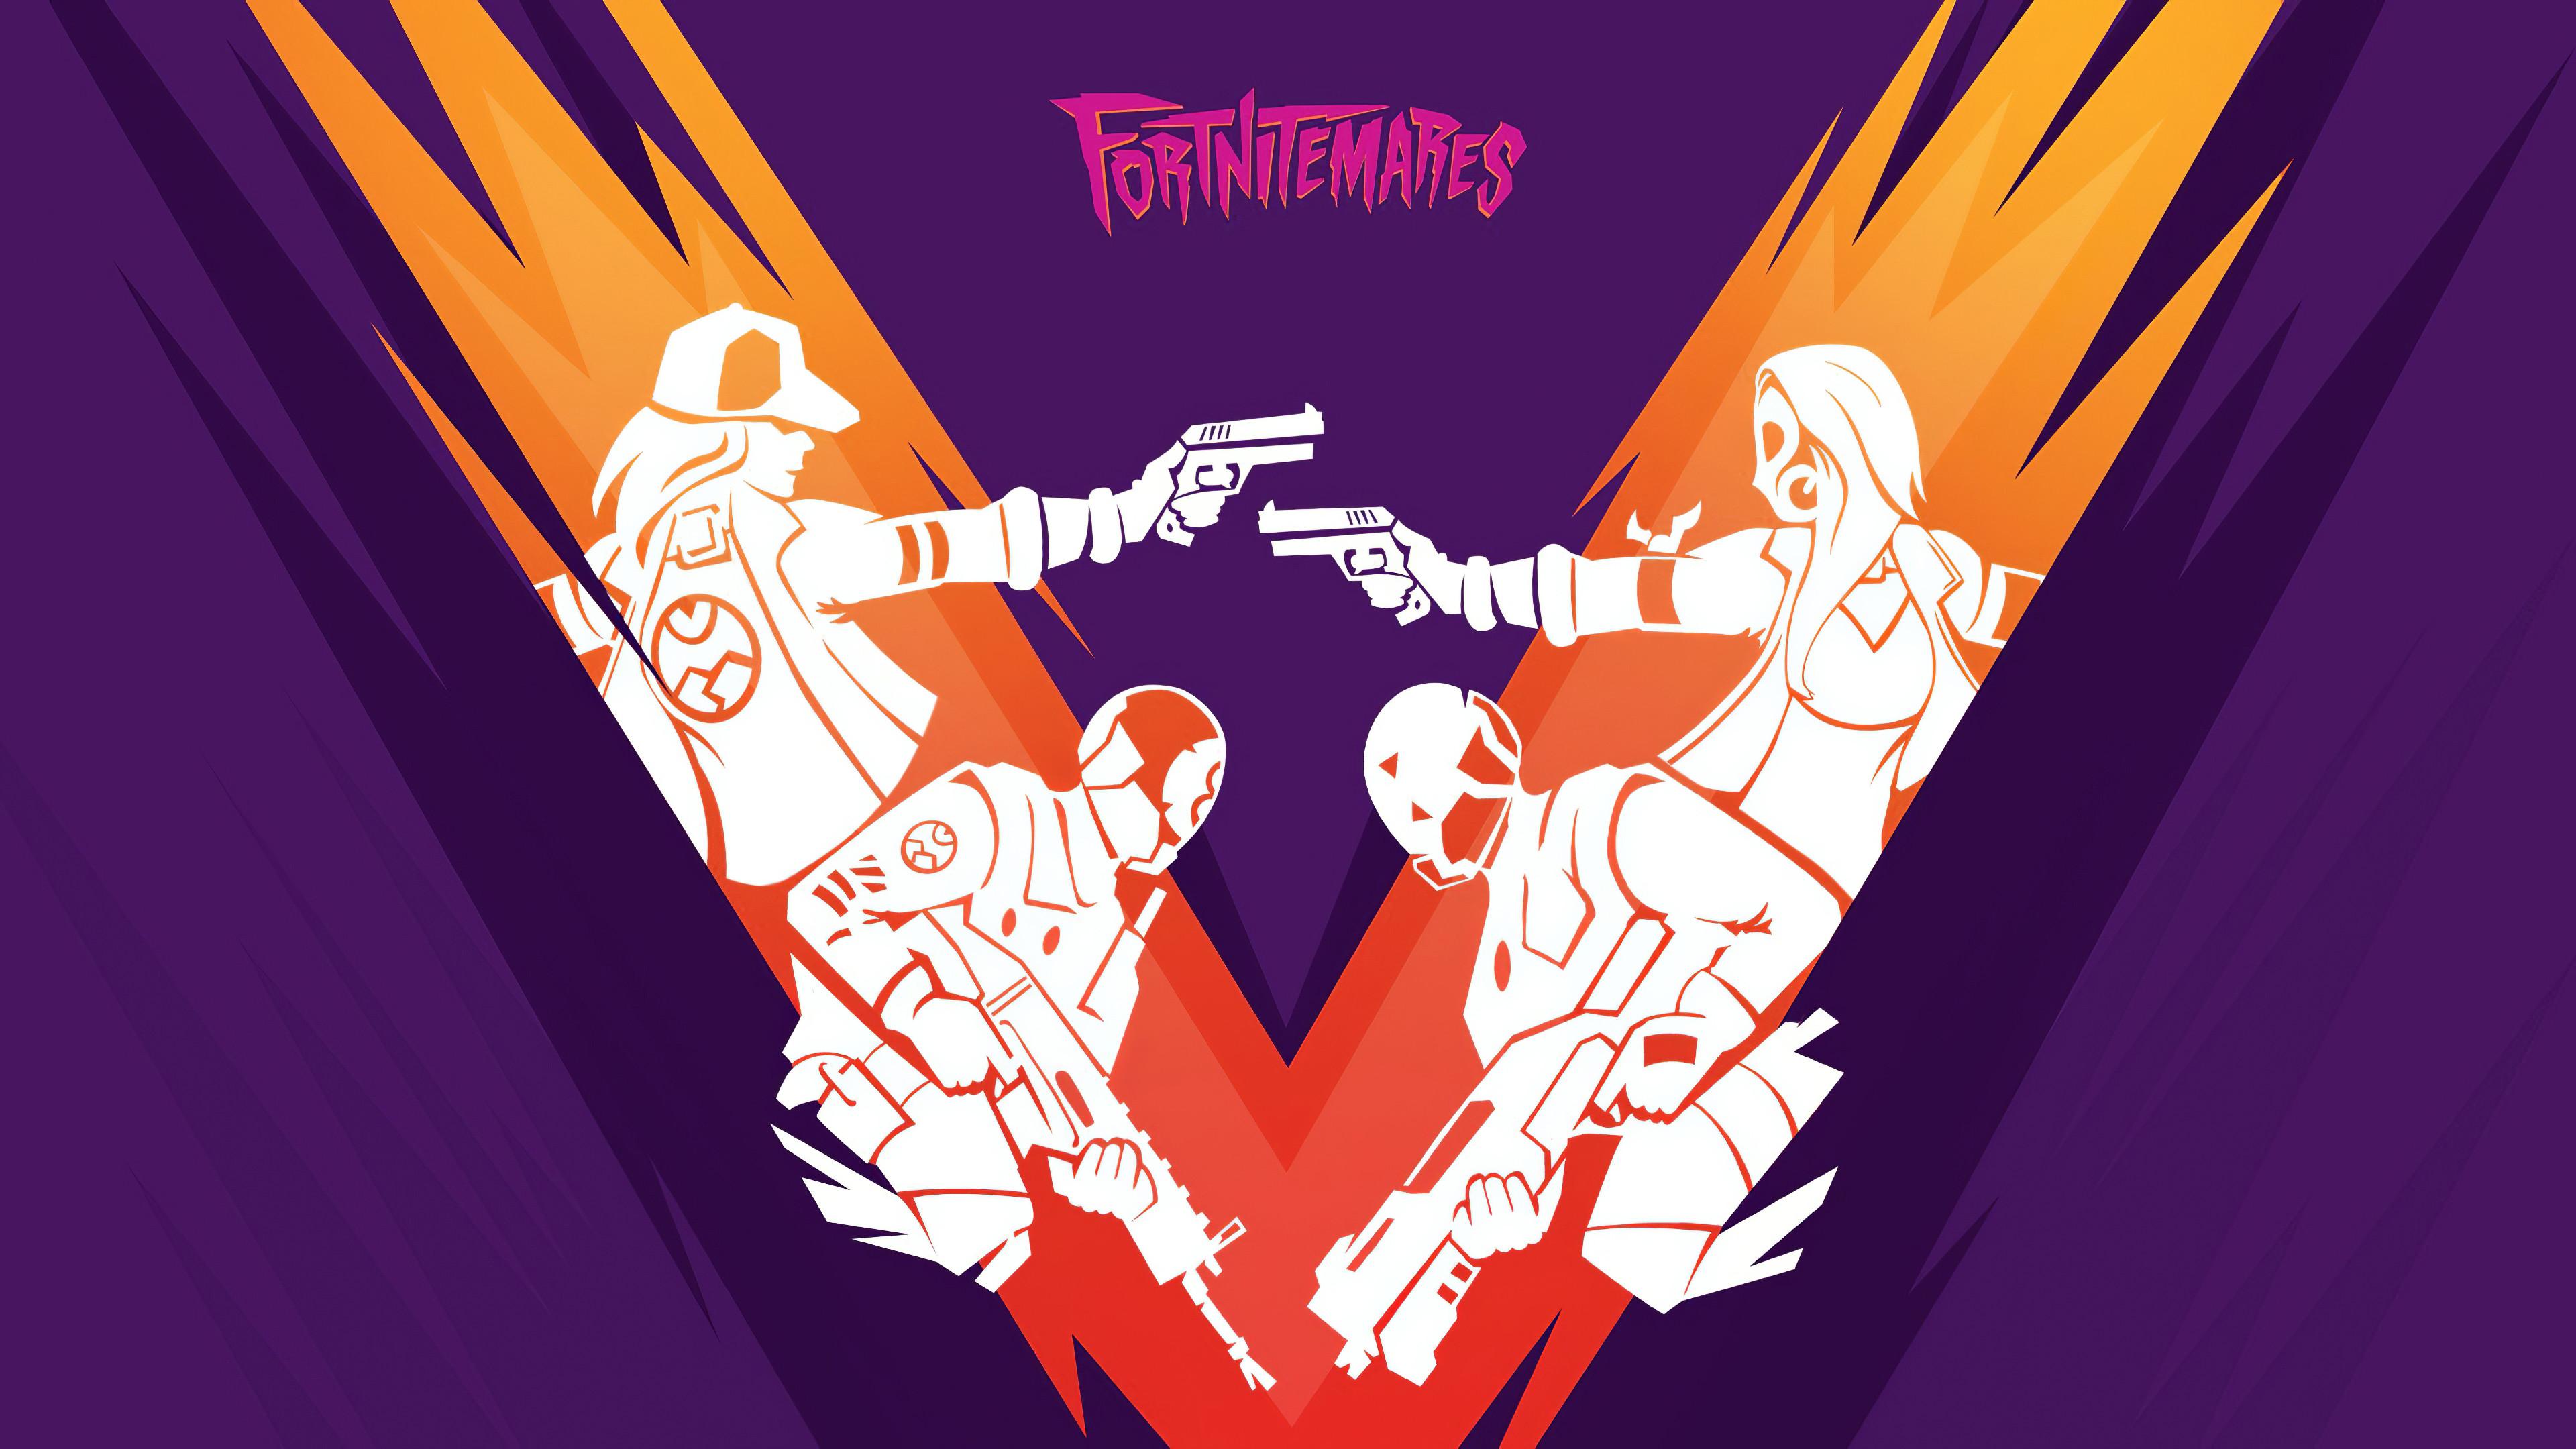 fortnitemares minimal 4k 05 3840x2160 1 - Fortnitemares Minimal - Fortnitemares wallpaper 4k, Fortnitemares Minimal 4k wallpaper